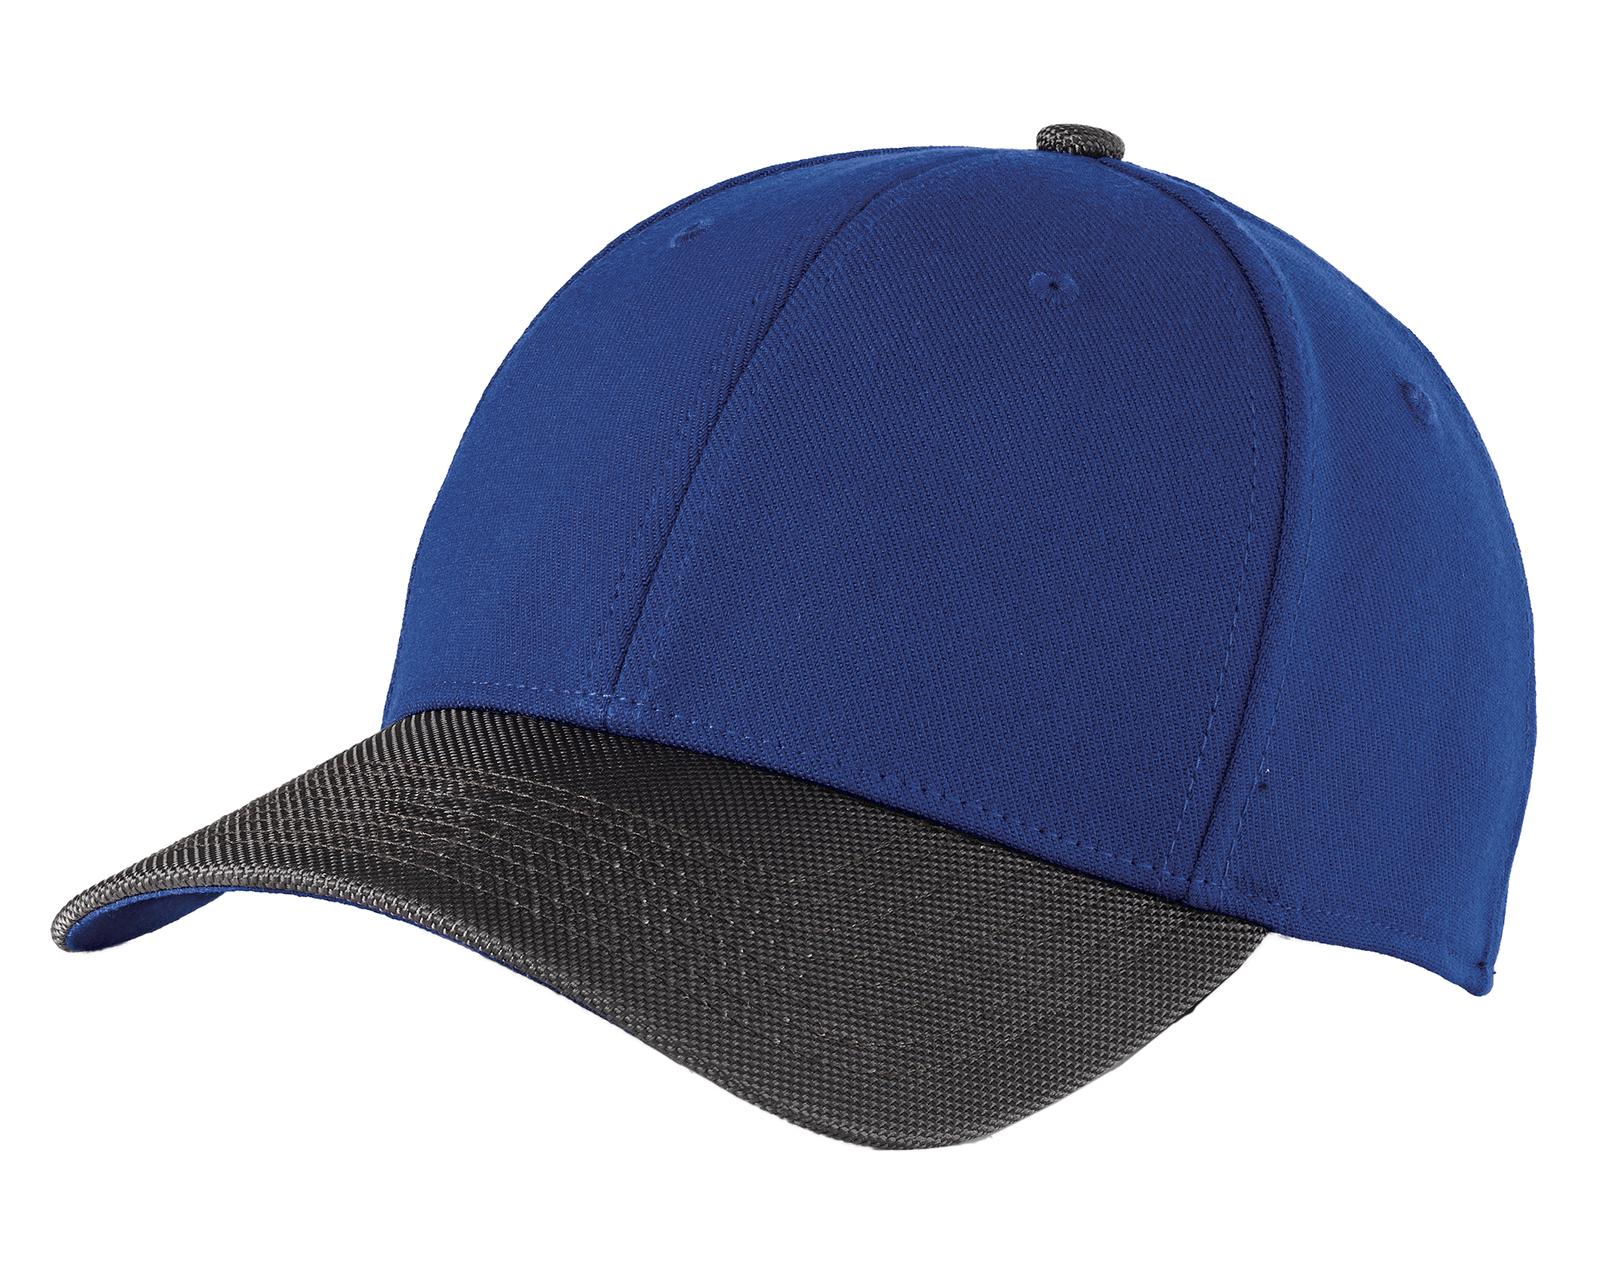 New Era Embroidered Ballistic Hat